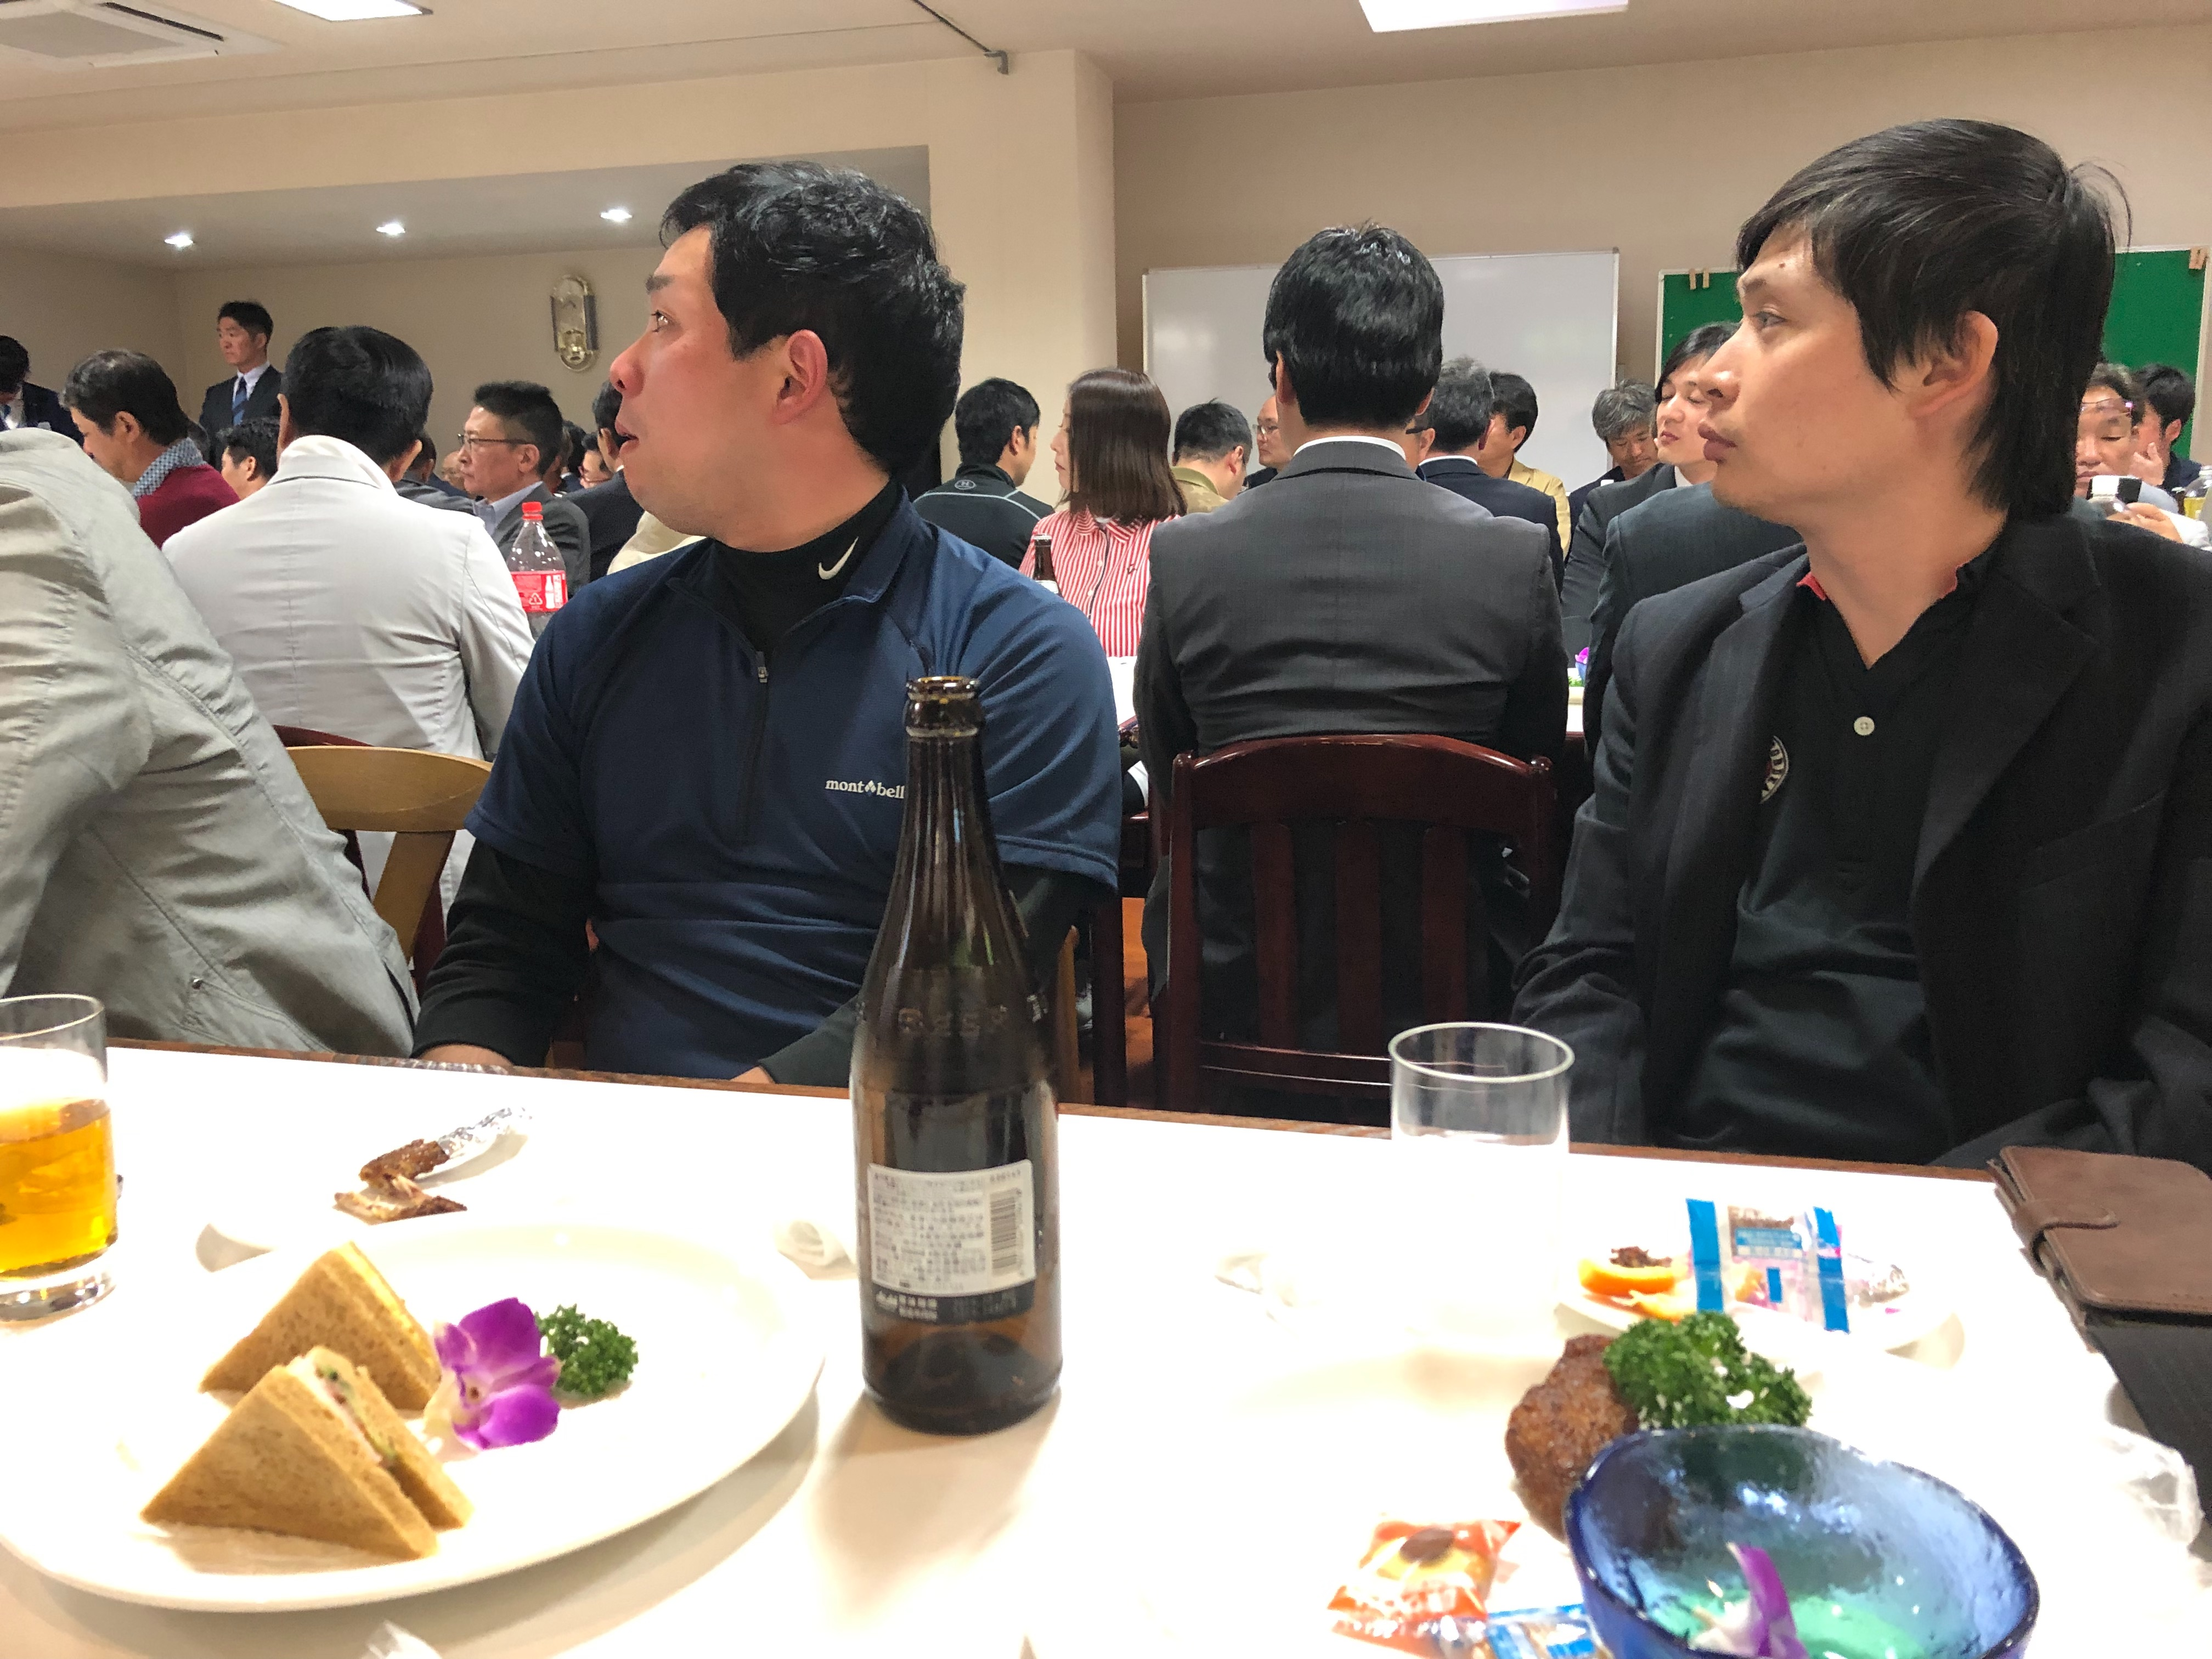 f:id:masanori-kato1972:20190427174853j:image